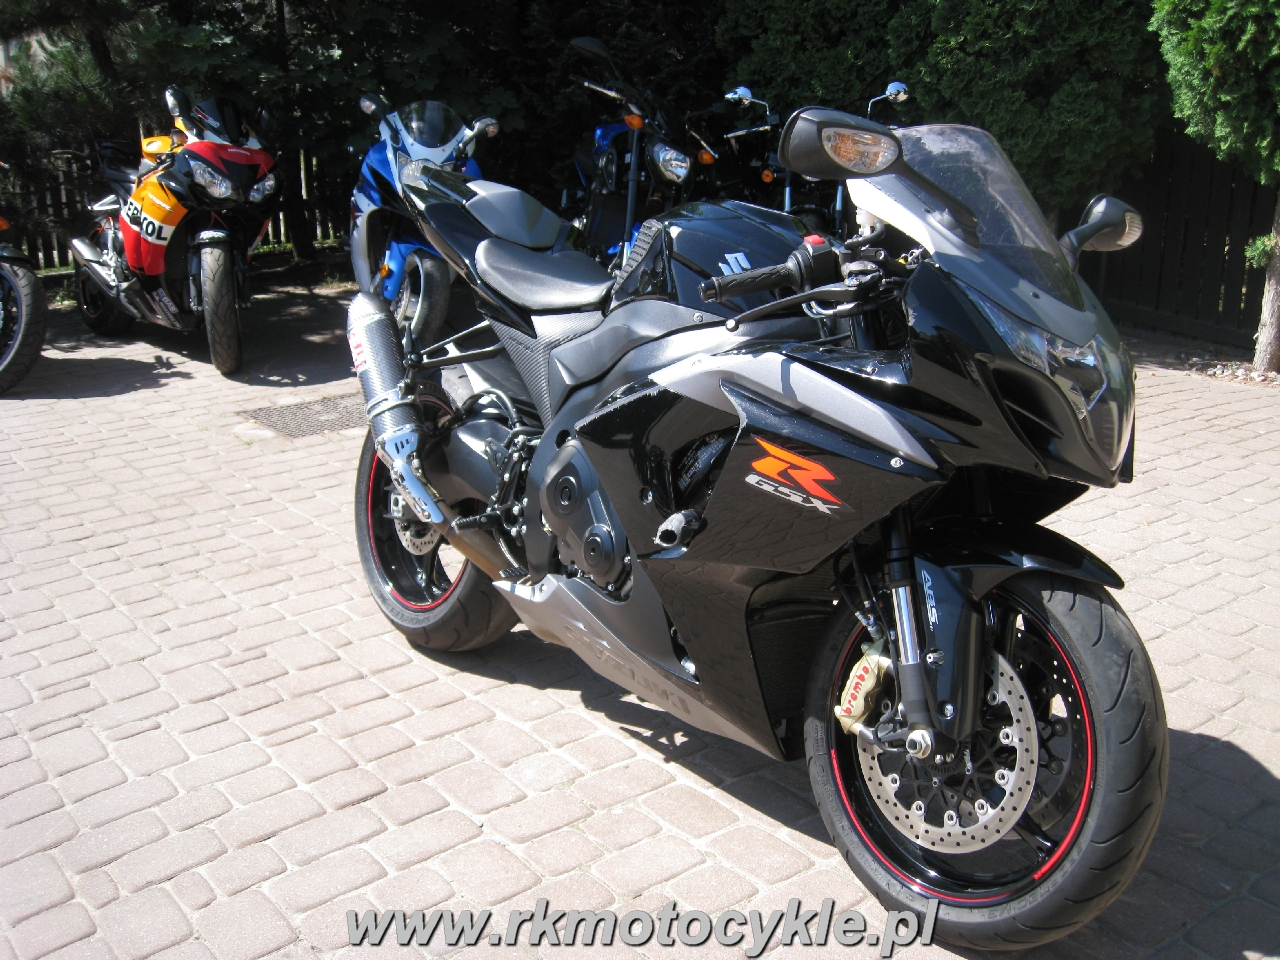 Brp Can Am >> RK MOTOCYKLE: SUZUKI GSXR 1000 ABS L5 GSX-R 1000 L0 L1 L2 ...